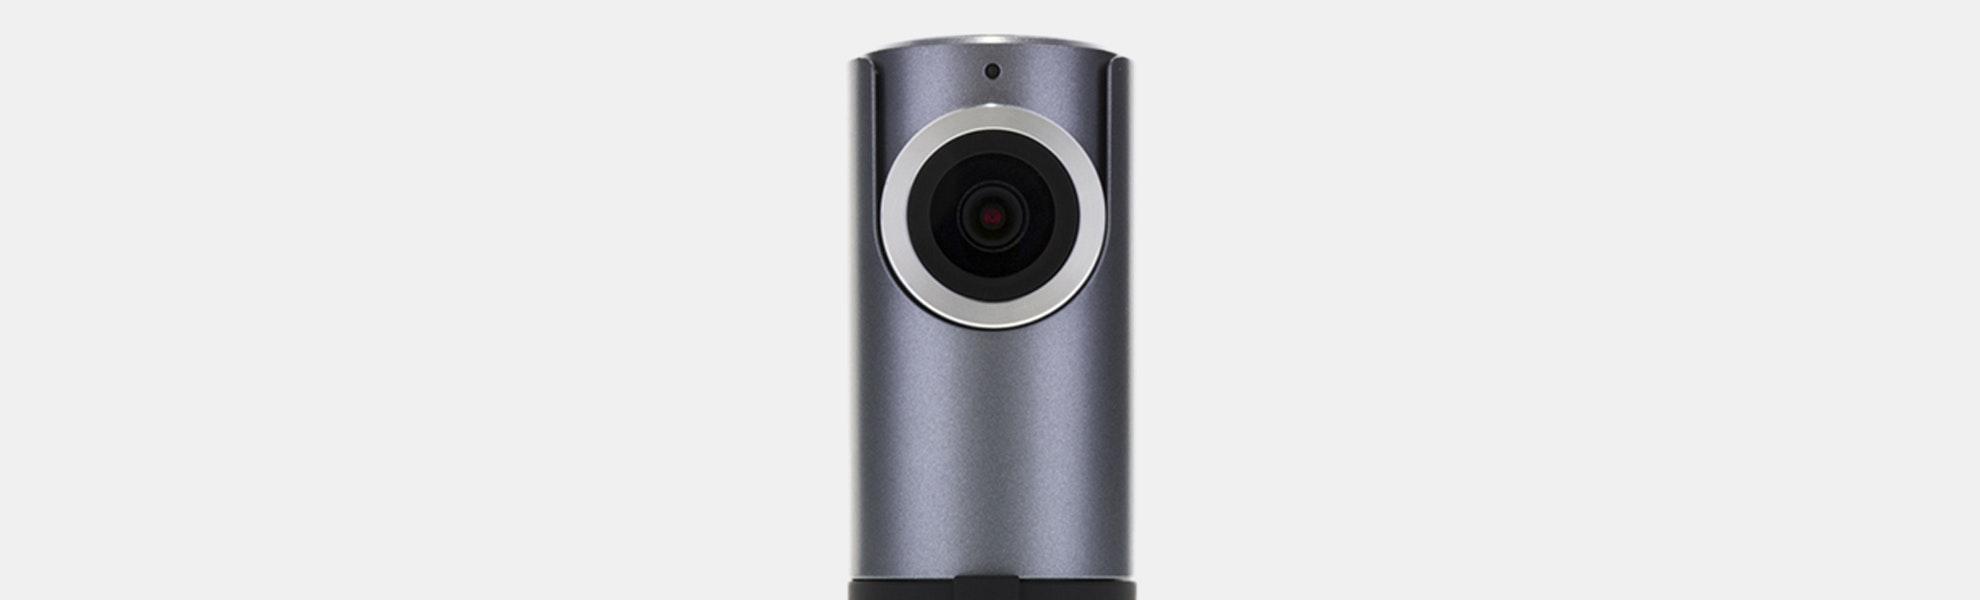 Goluk T1 Dash Cam With 32GB Card